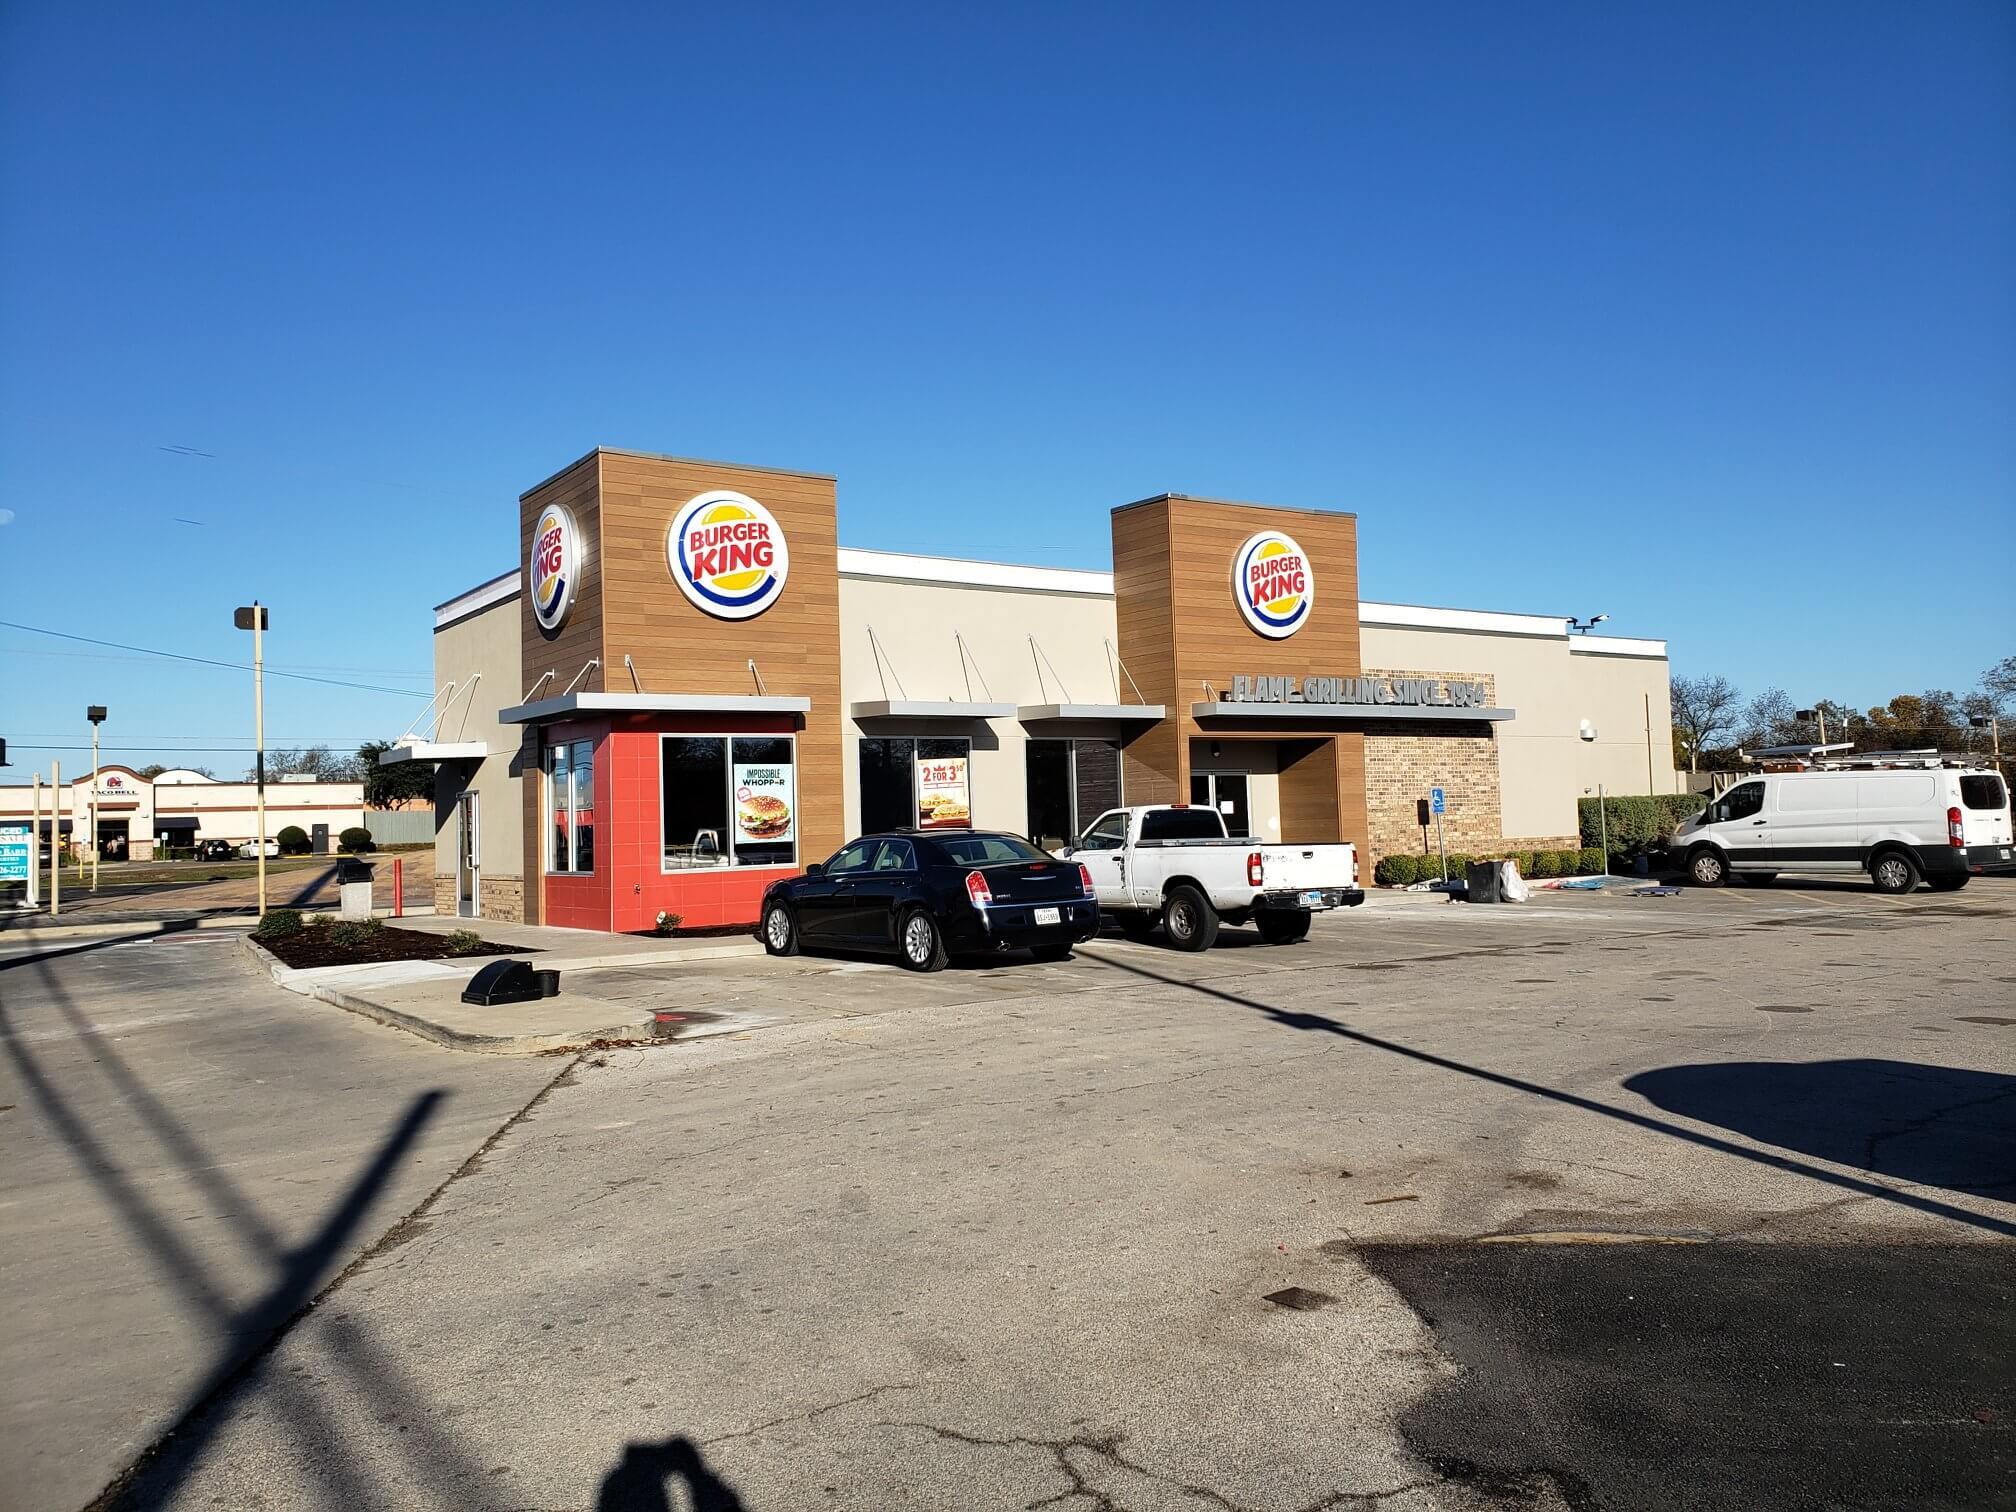 Killeen Burger King Remodel